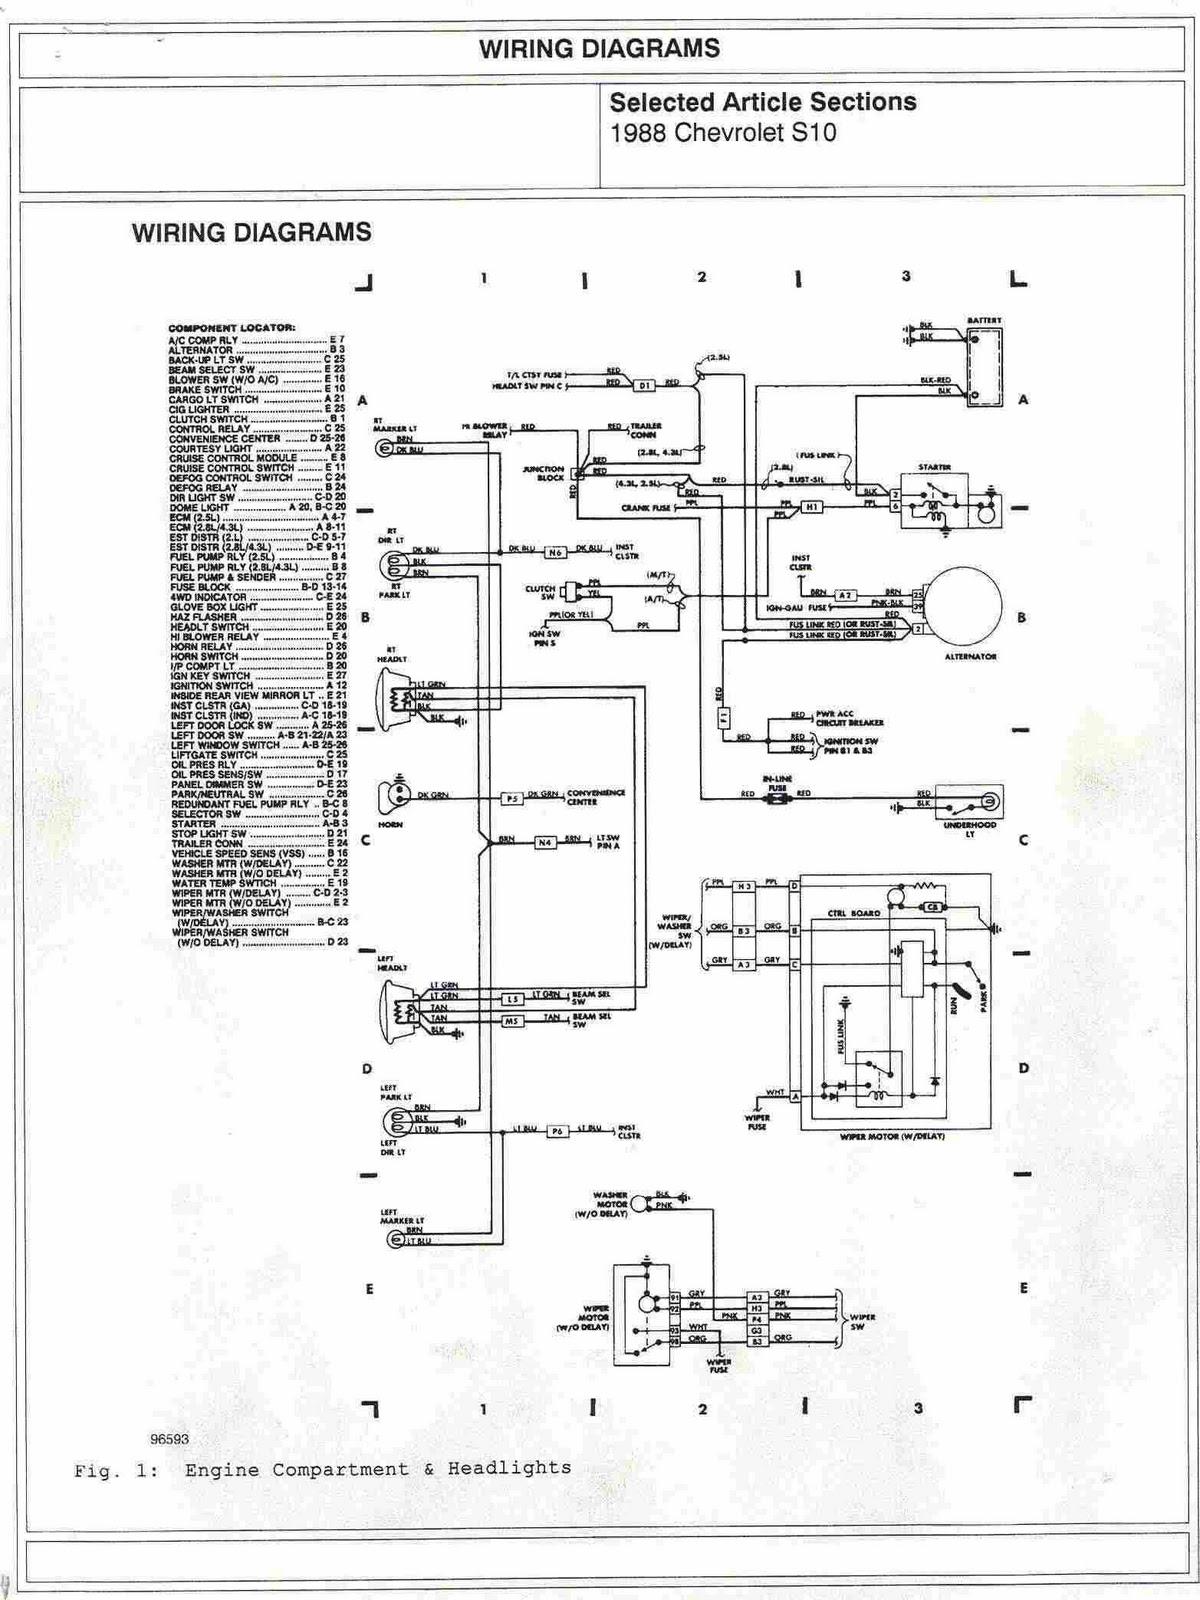 1984 toyota pickup headlight wiring diagram somurich com rh somurich com 1988 Chevy Pickup 1982 Chevy Pickup